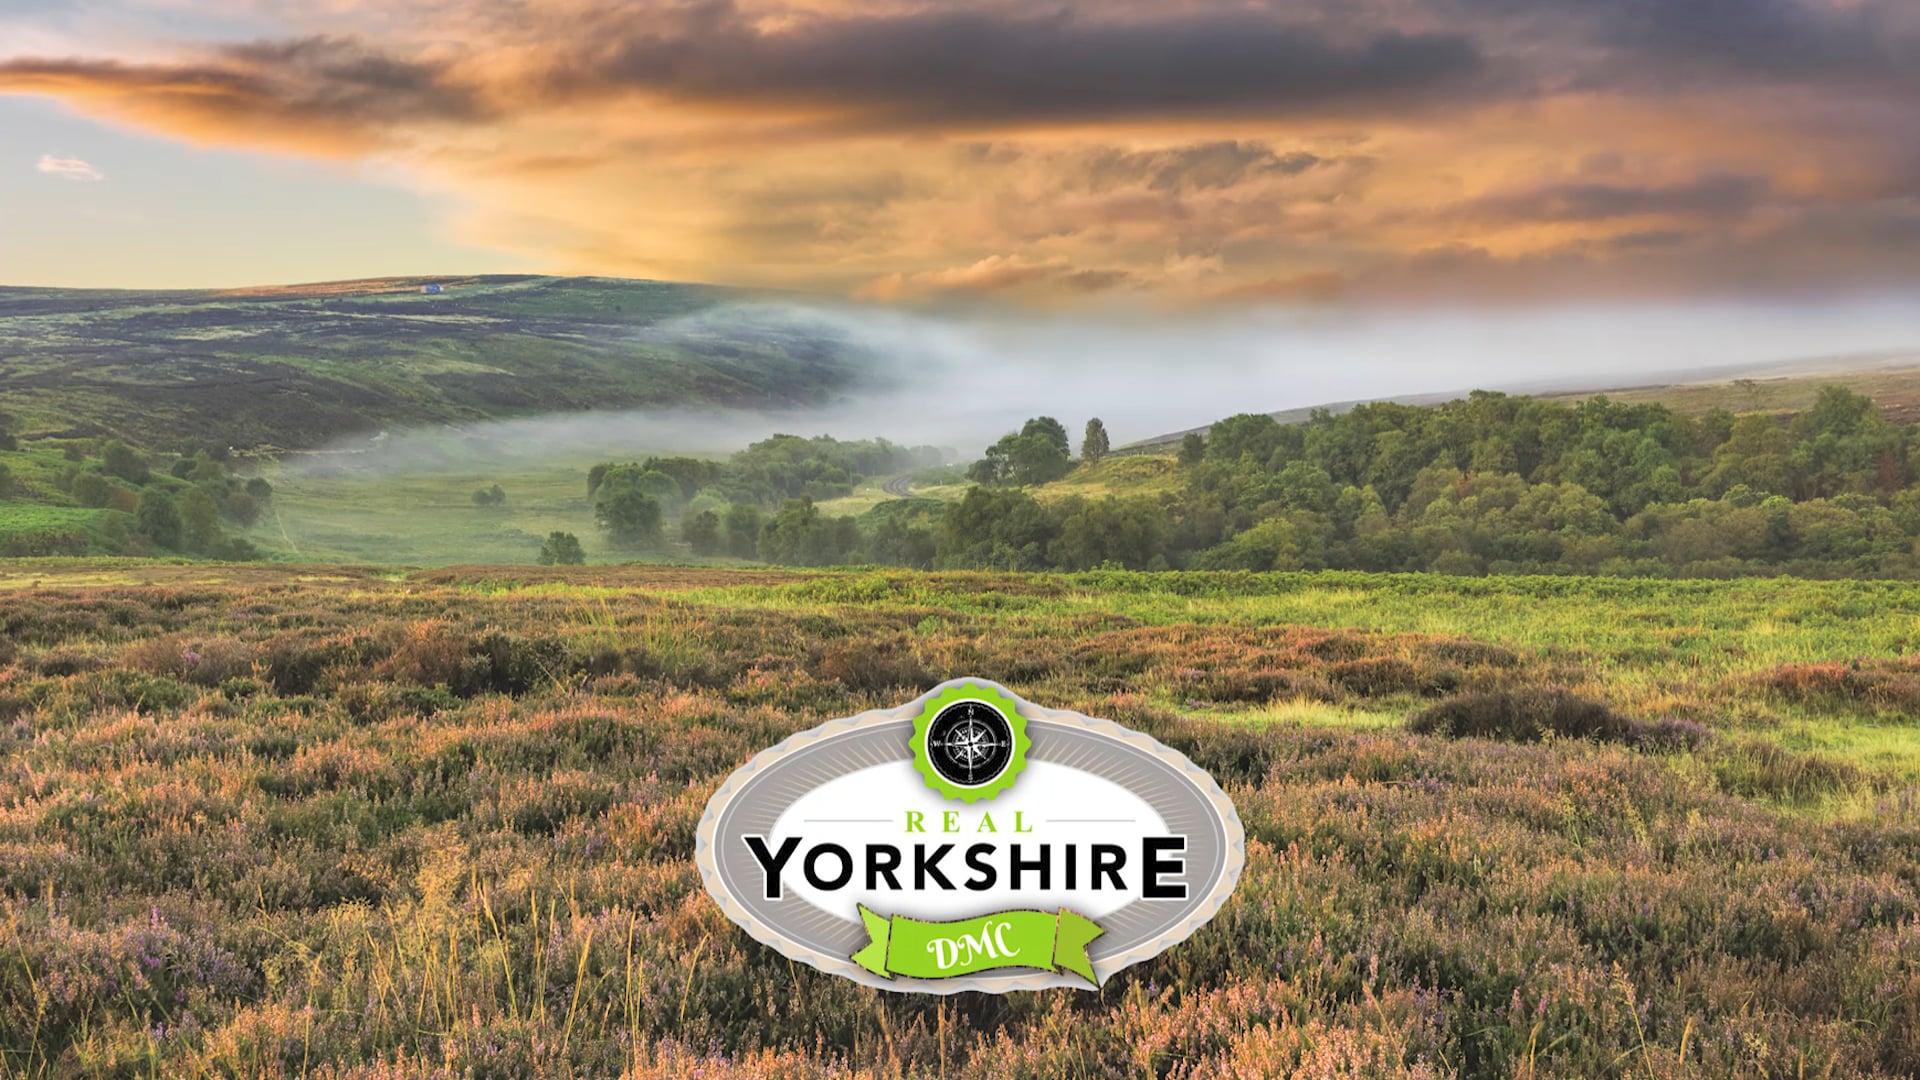 Real Yorkshire DMC video